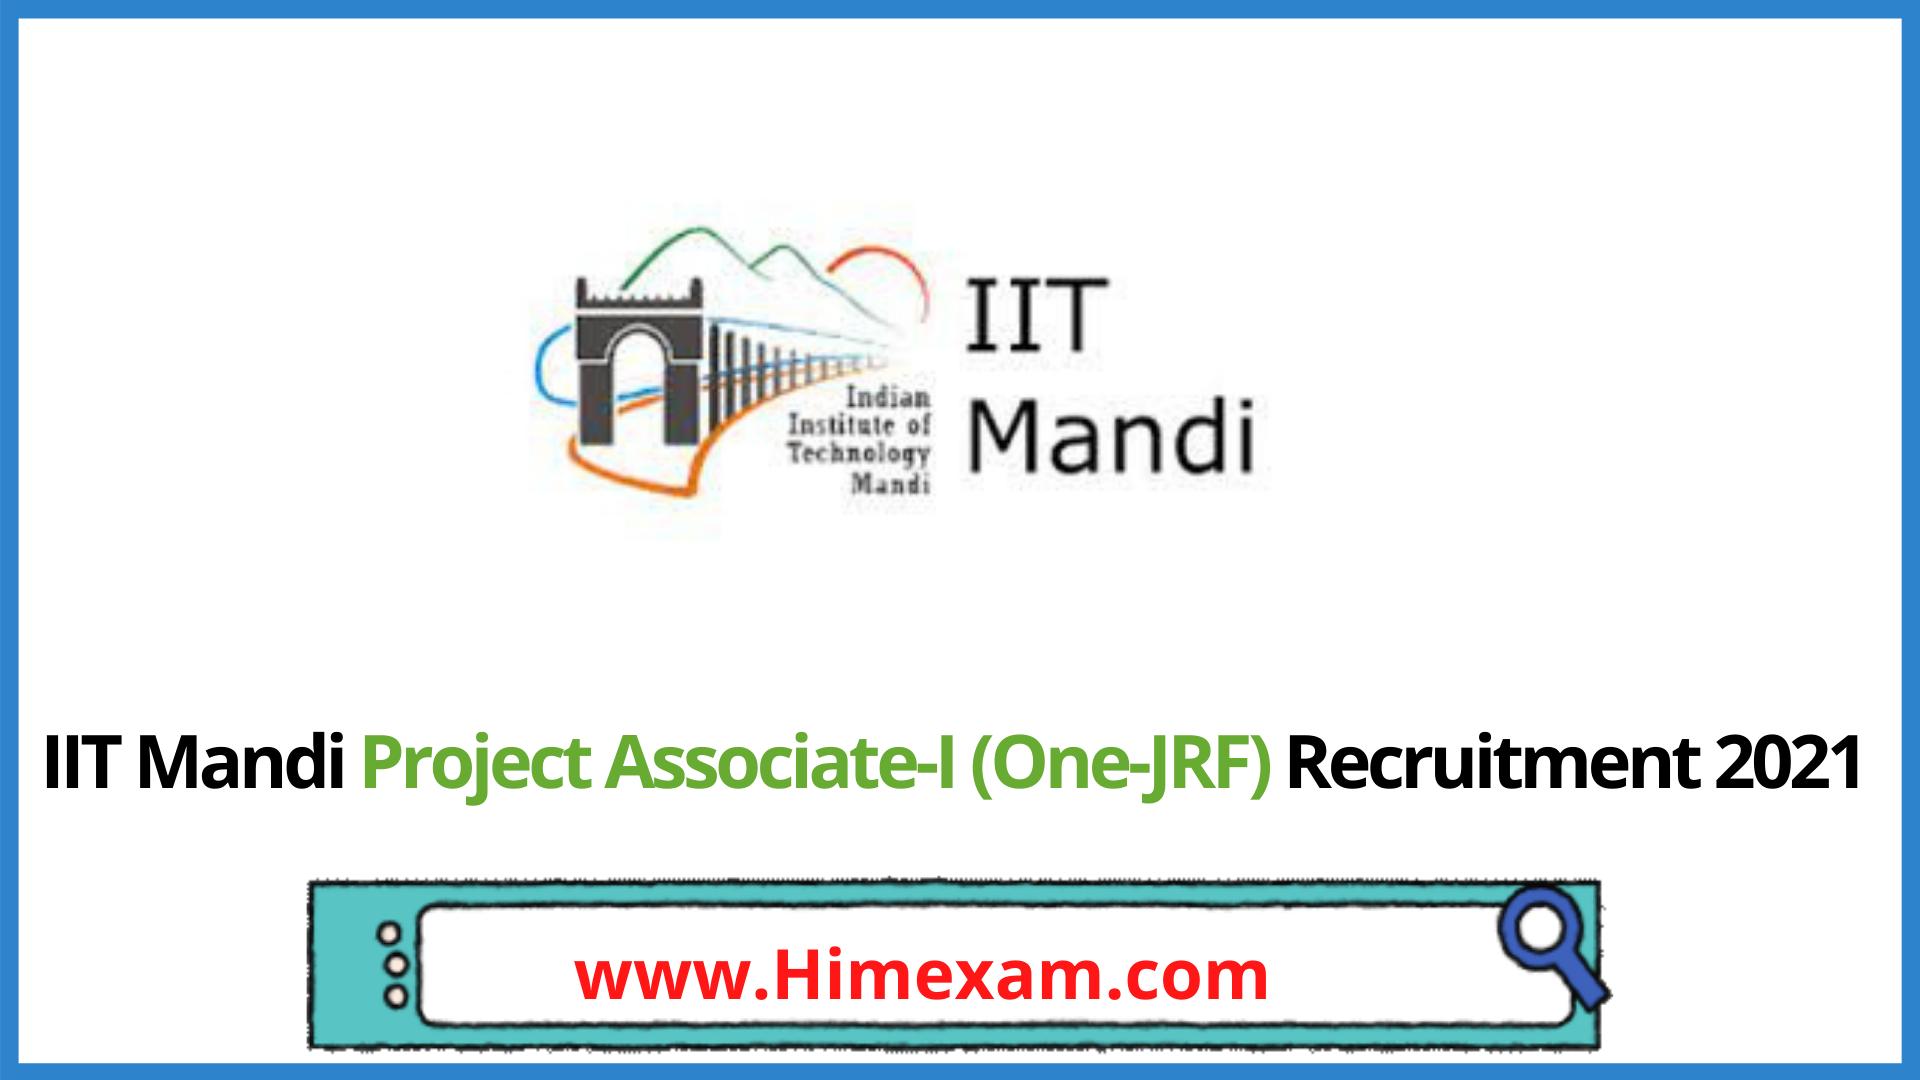 IIT Mandi Project Associate-I (One-JRF) Recruitment 2021